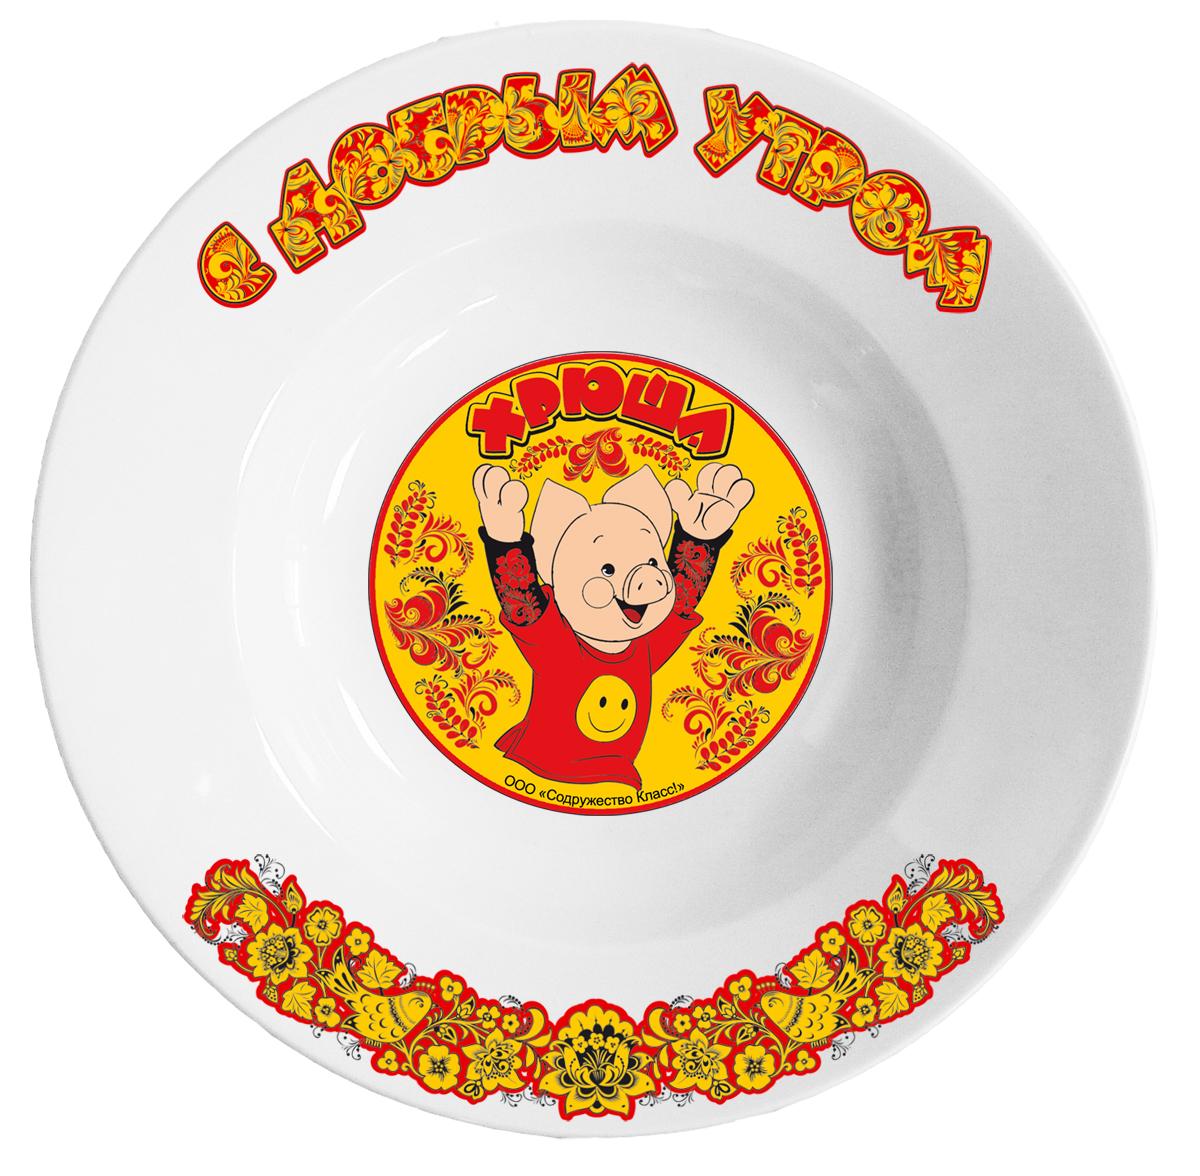 Тарелка детская Хрюша диаметр 20 см тарелка псковский гончар орнамент цвет бежевый диаметр 20 см